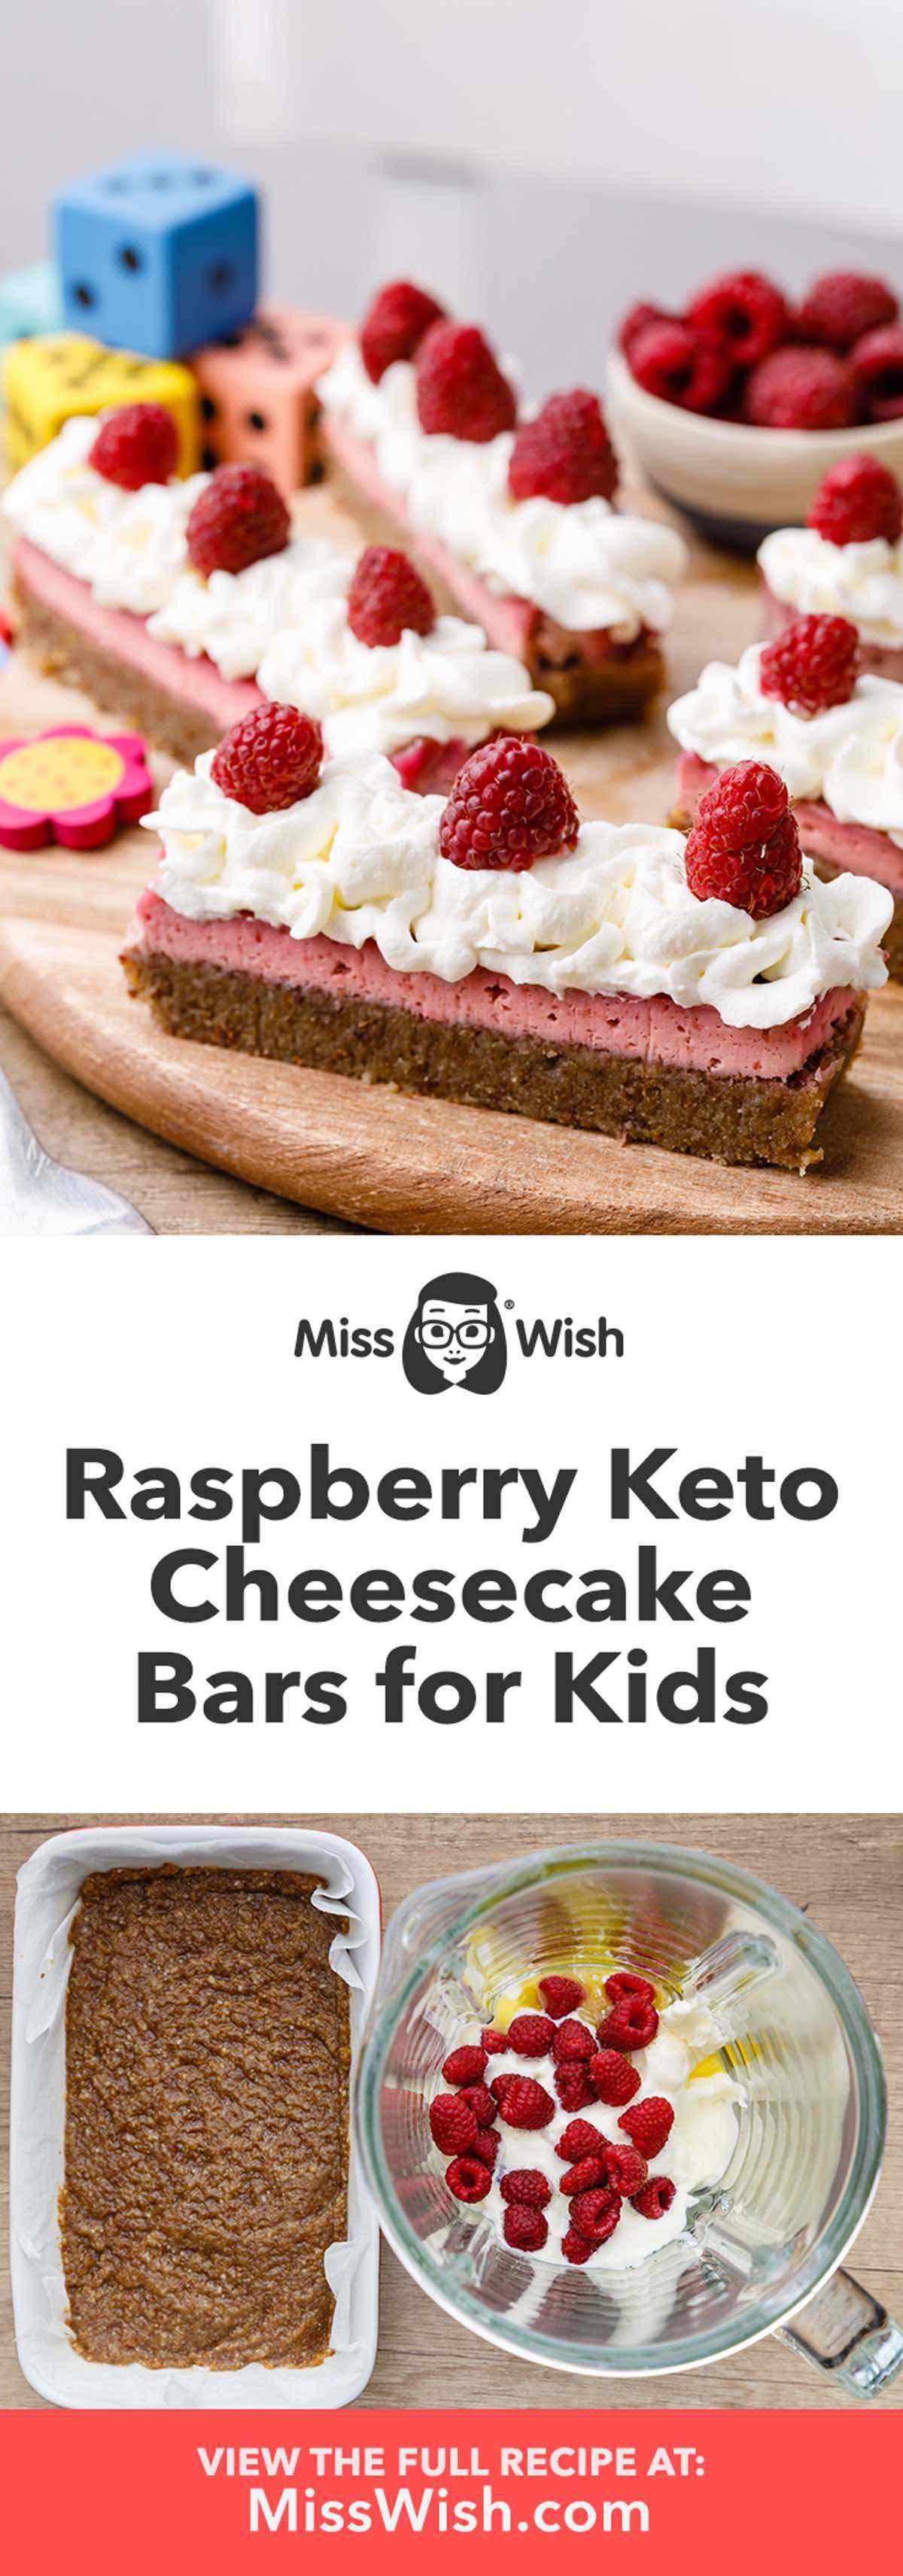 Raspberry Keto Cheesecake Bars